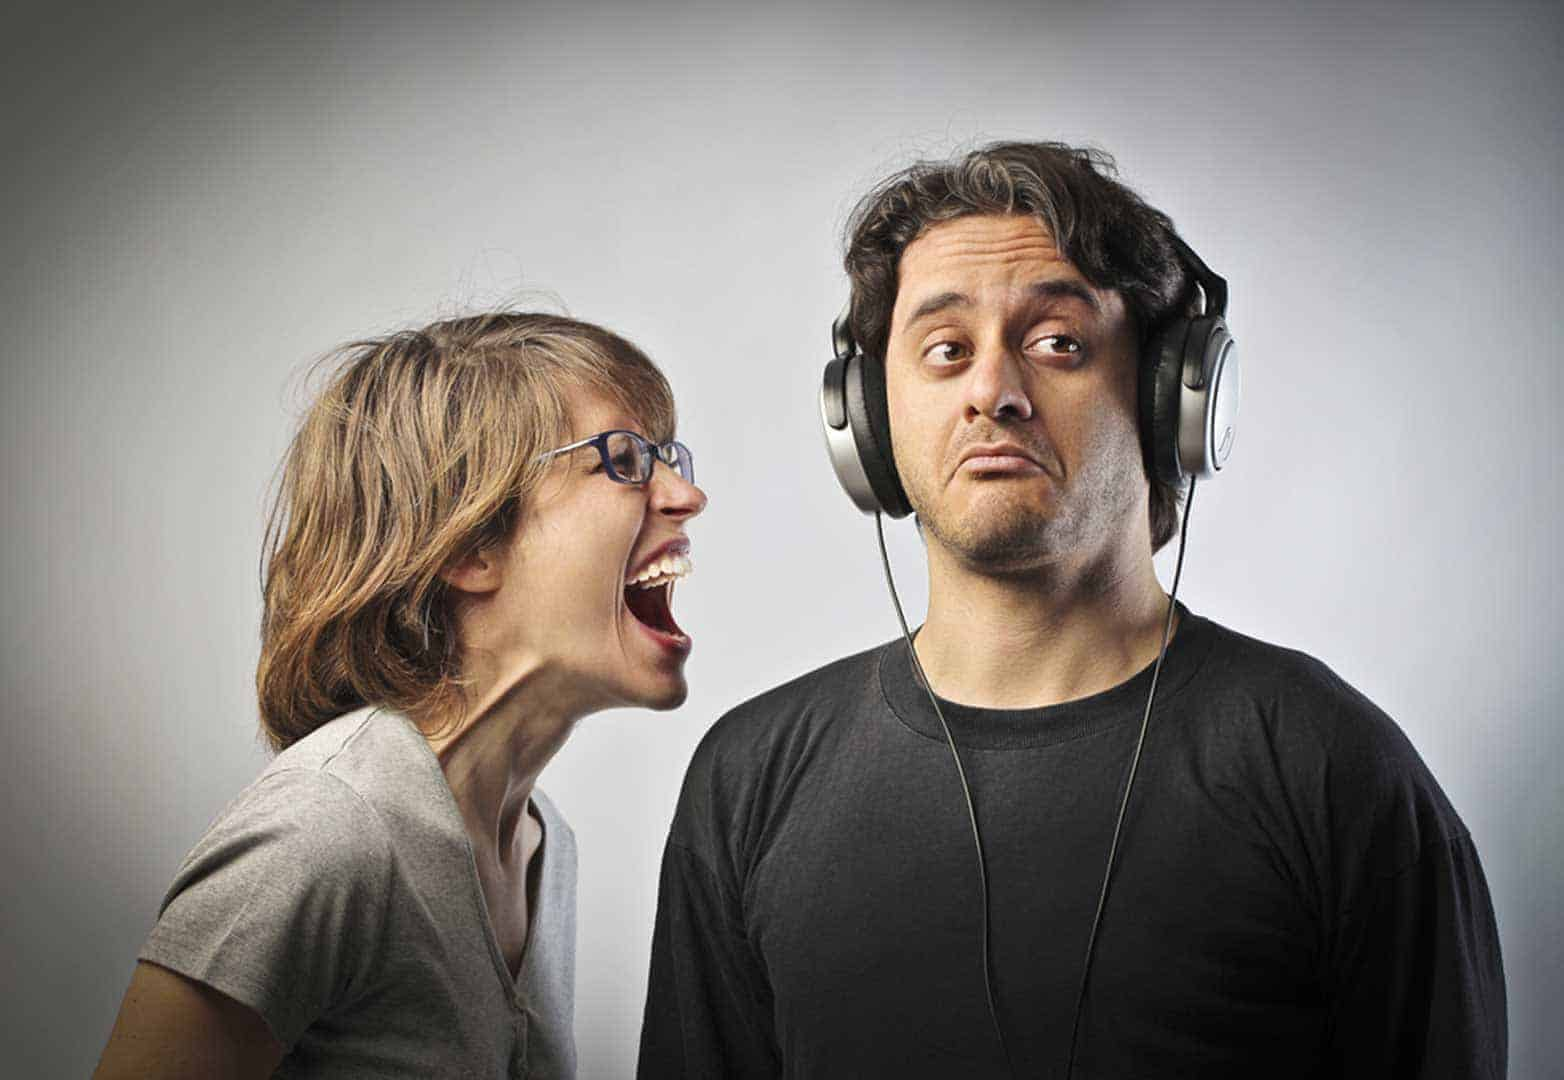 Disruption, ignoring the voices around you